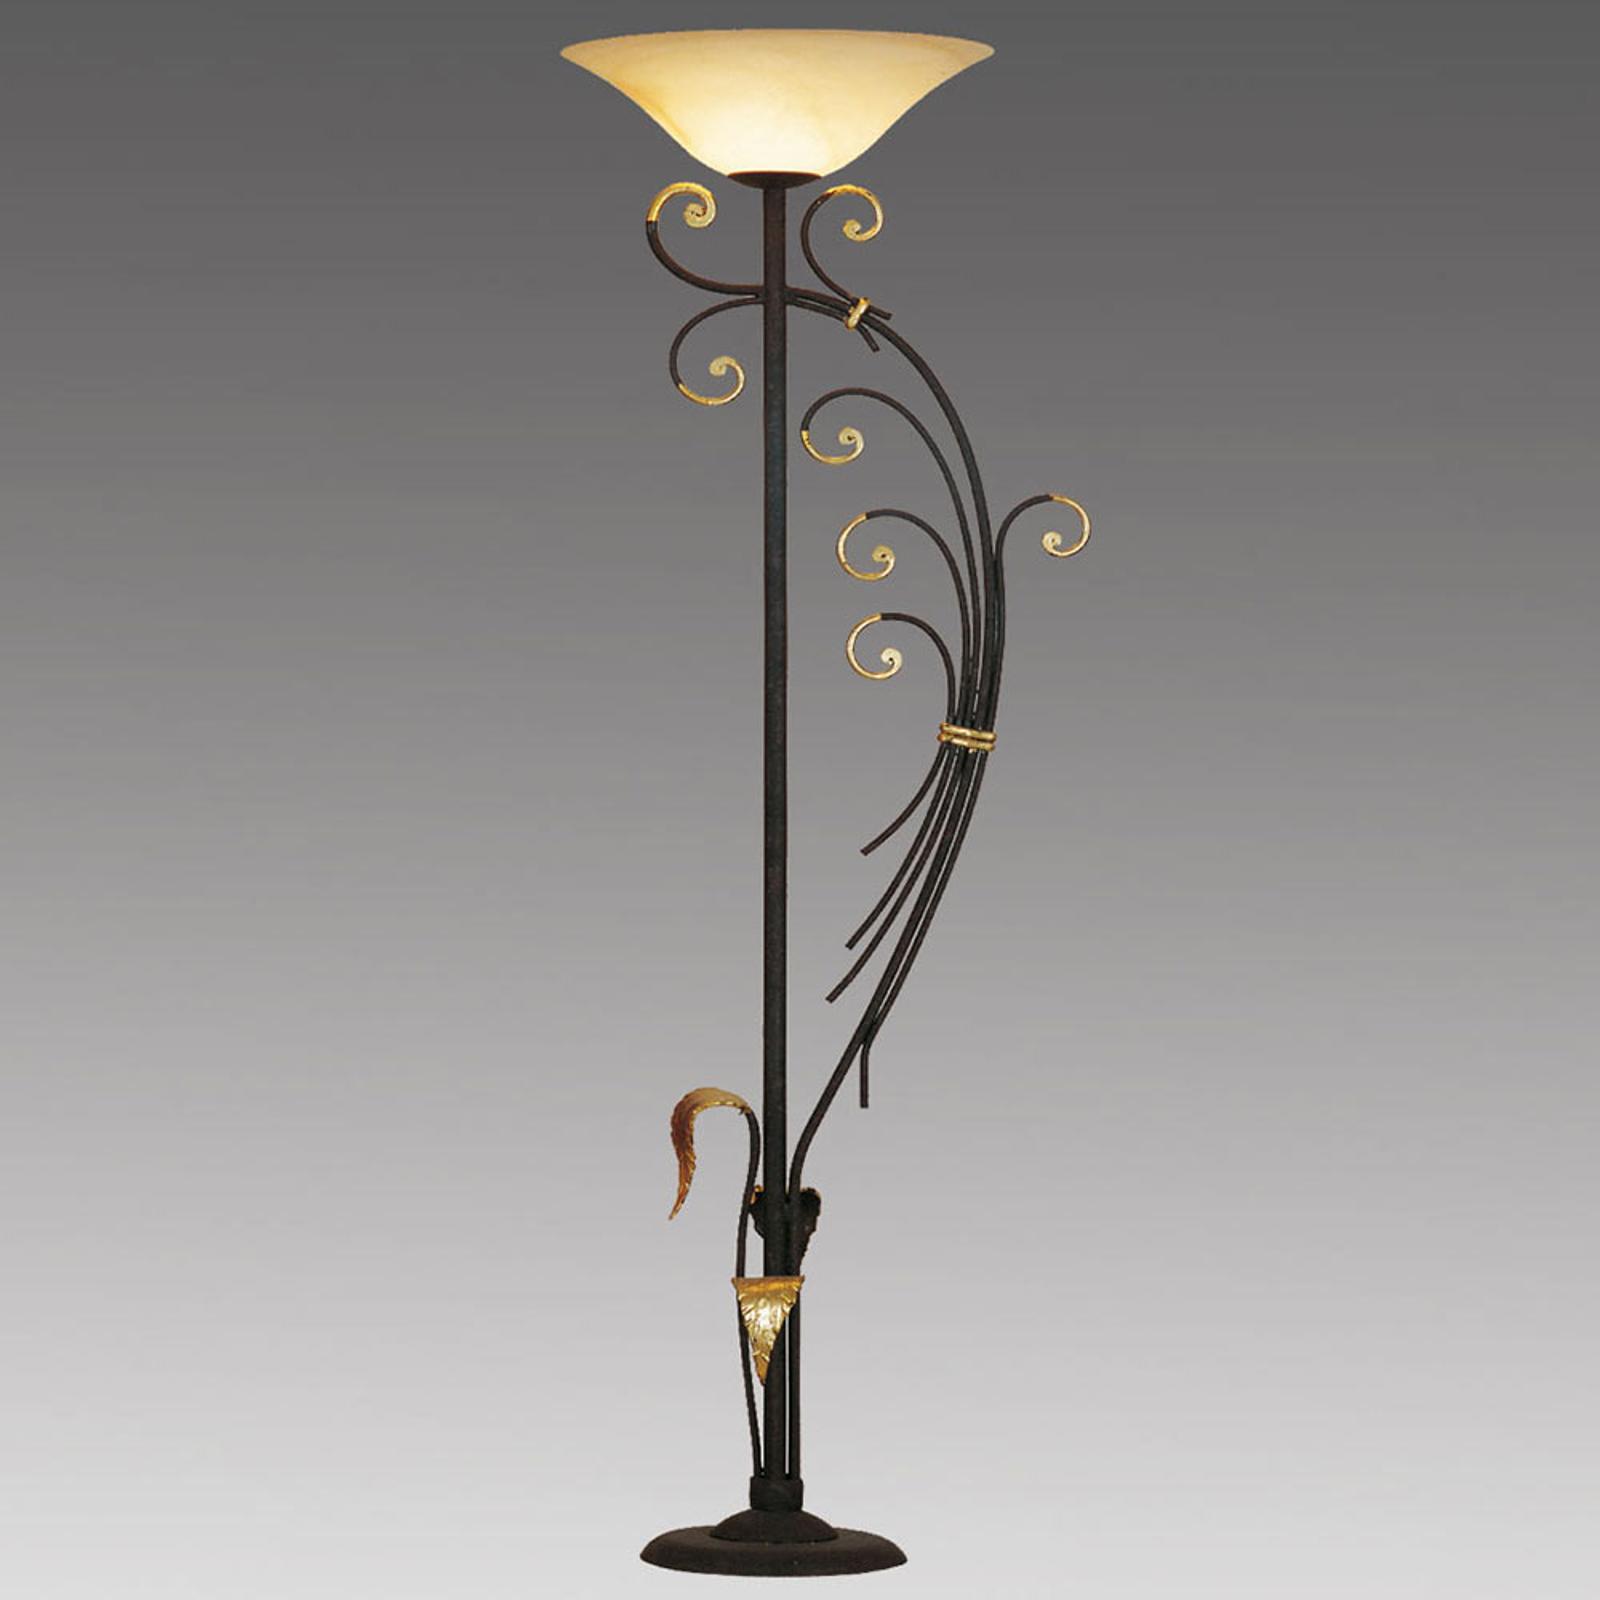 Gulvlampe Florence dekorert med bladgull